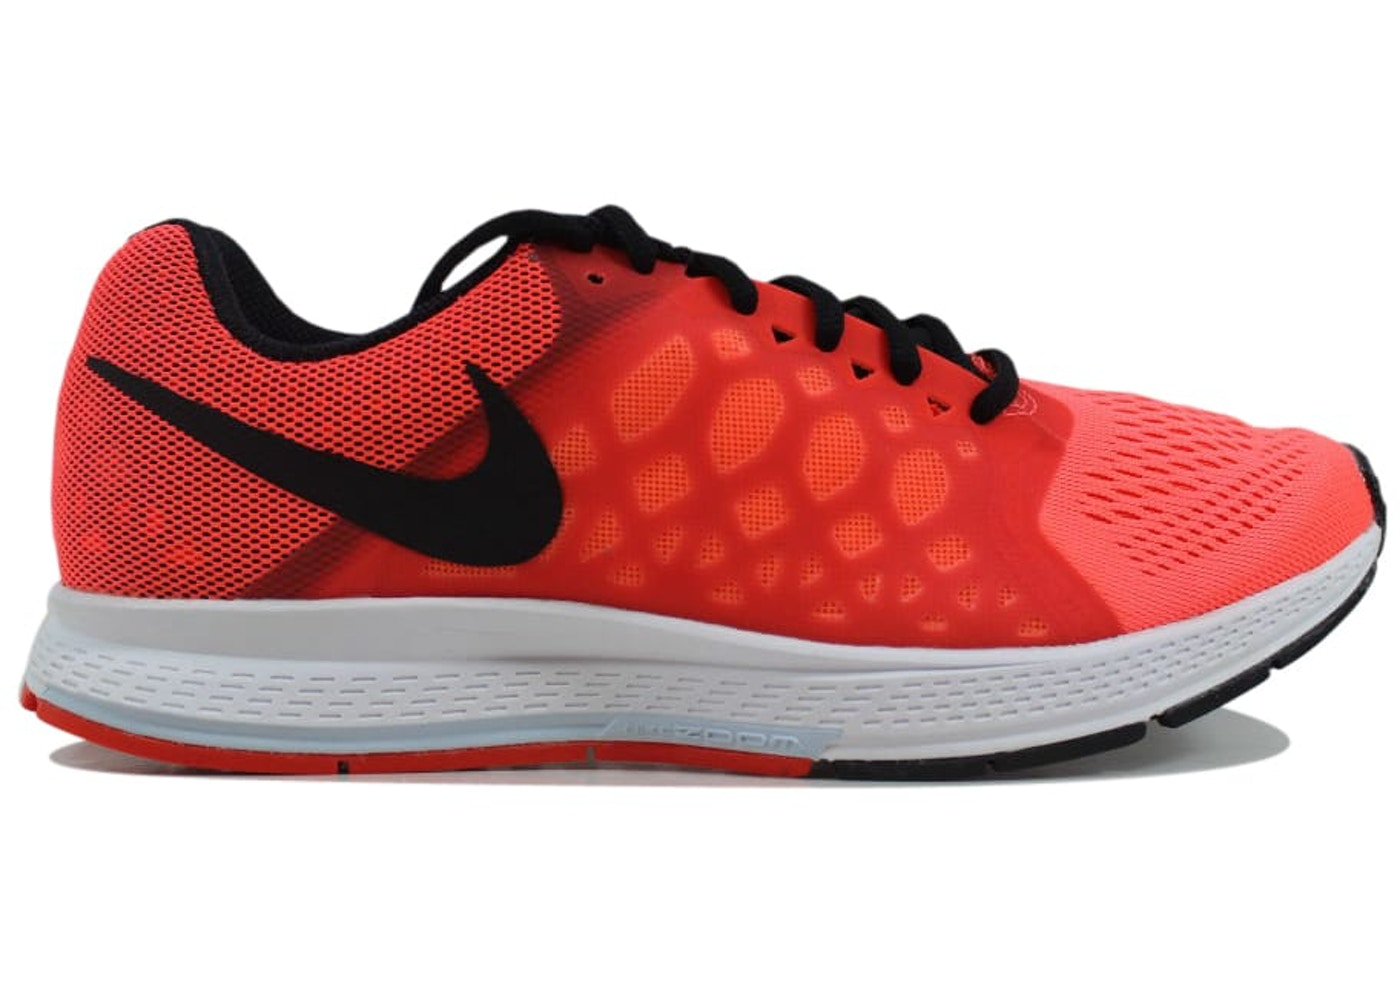 rechazo recuerdos Exención  Nike Air Zoom Pegasus 31 Hot Lava - 652925-803